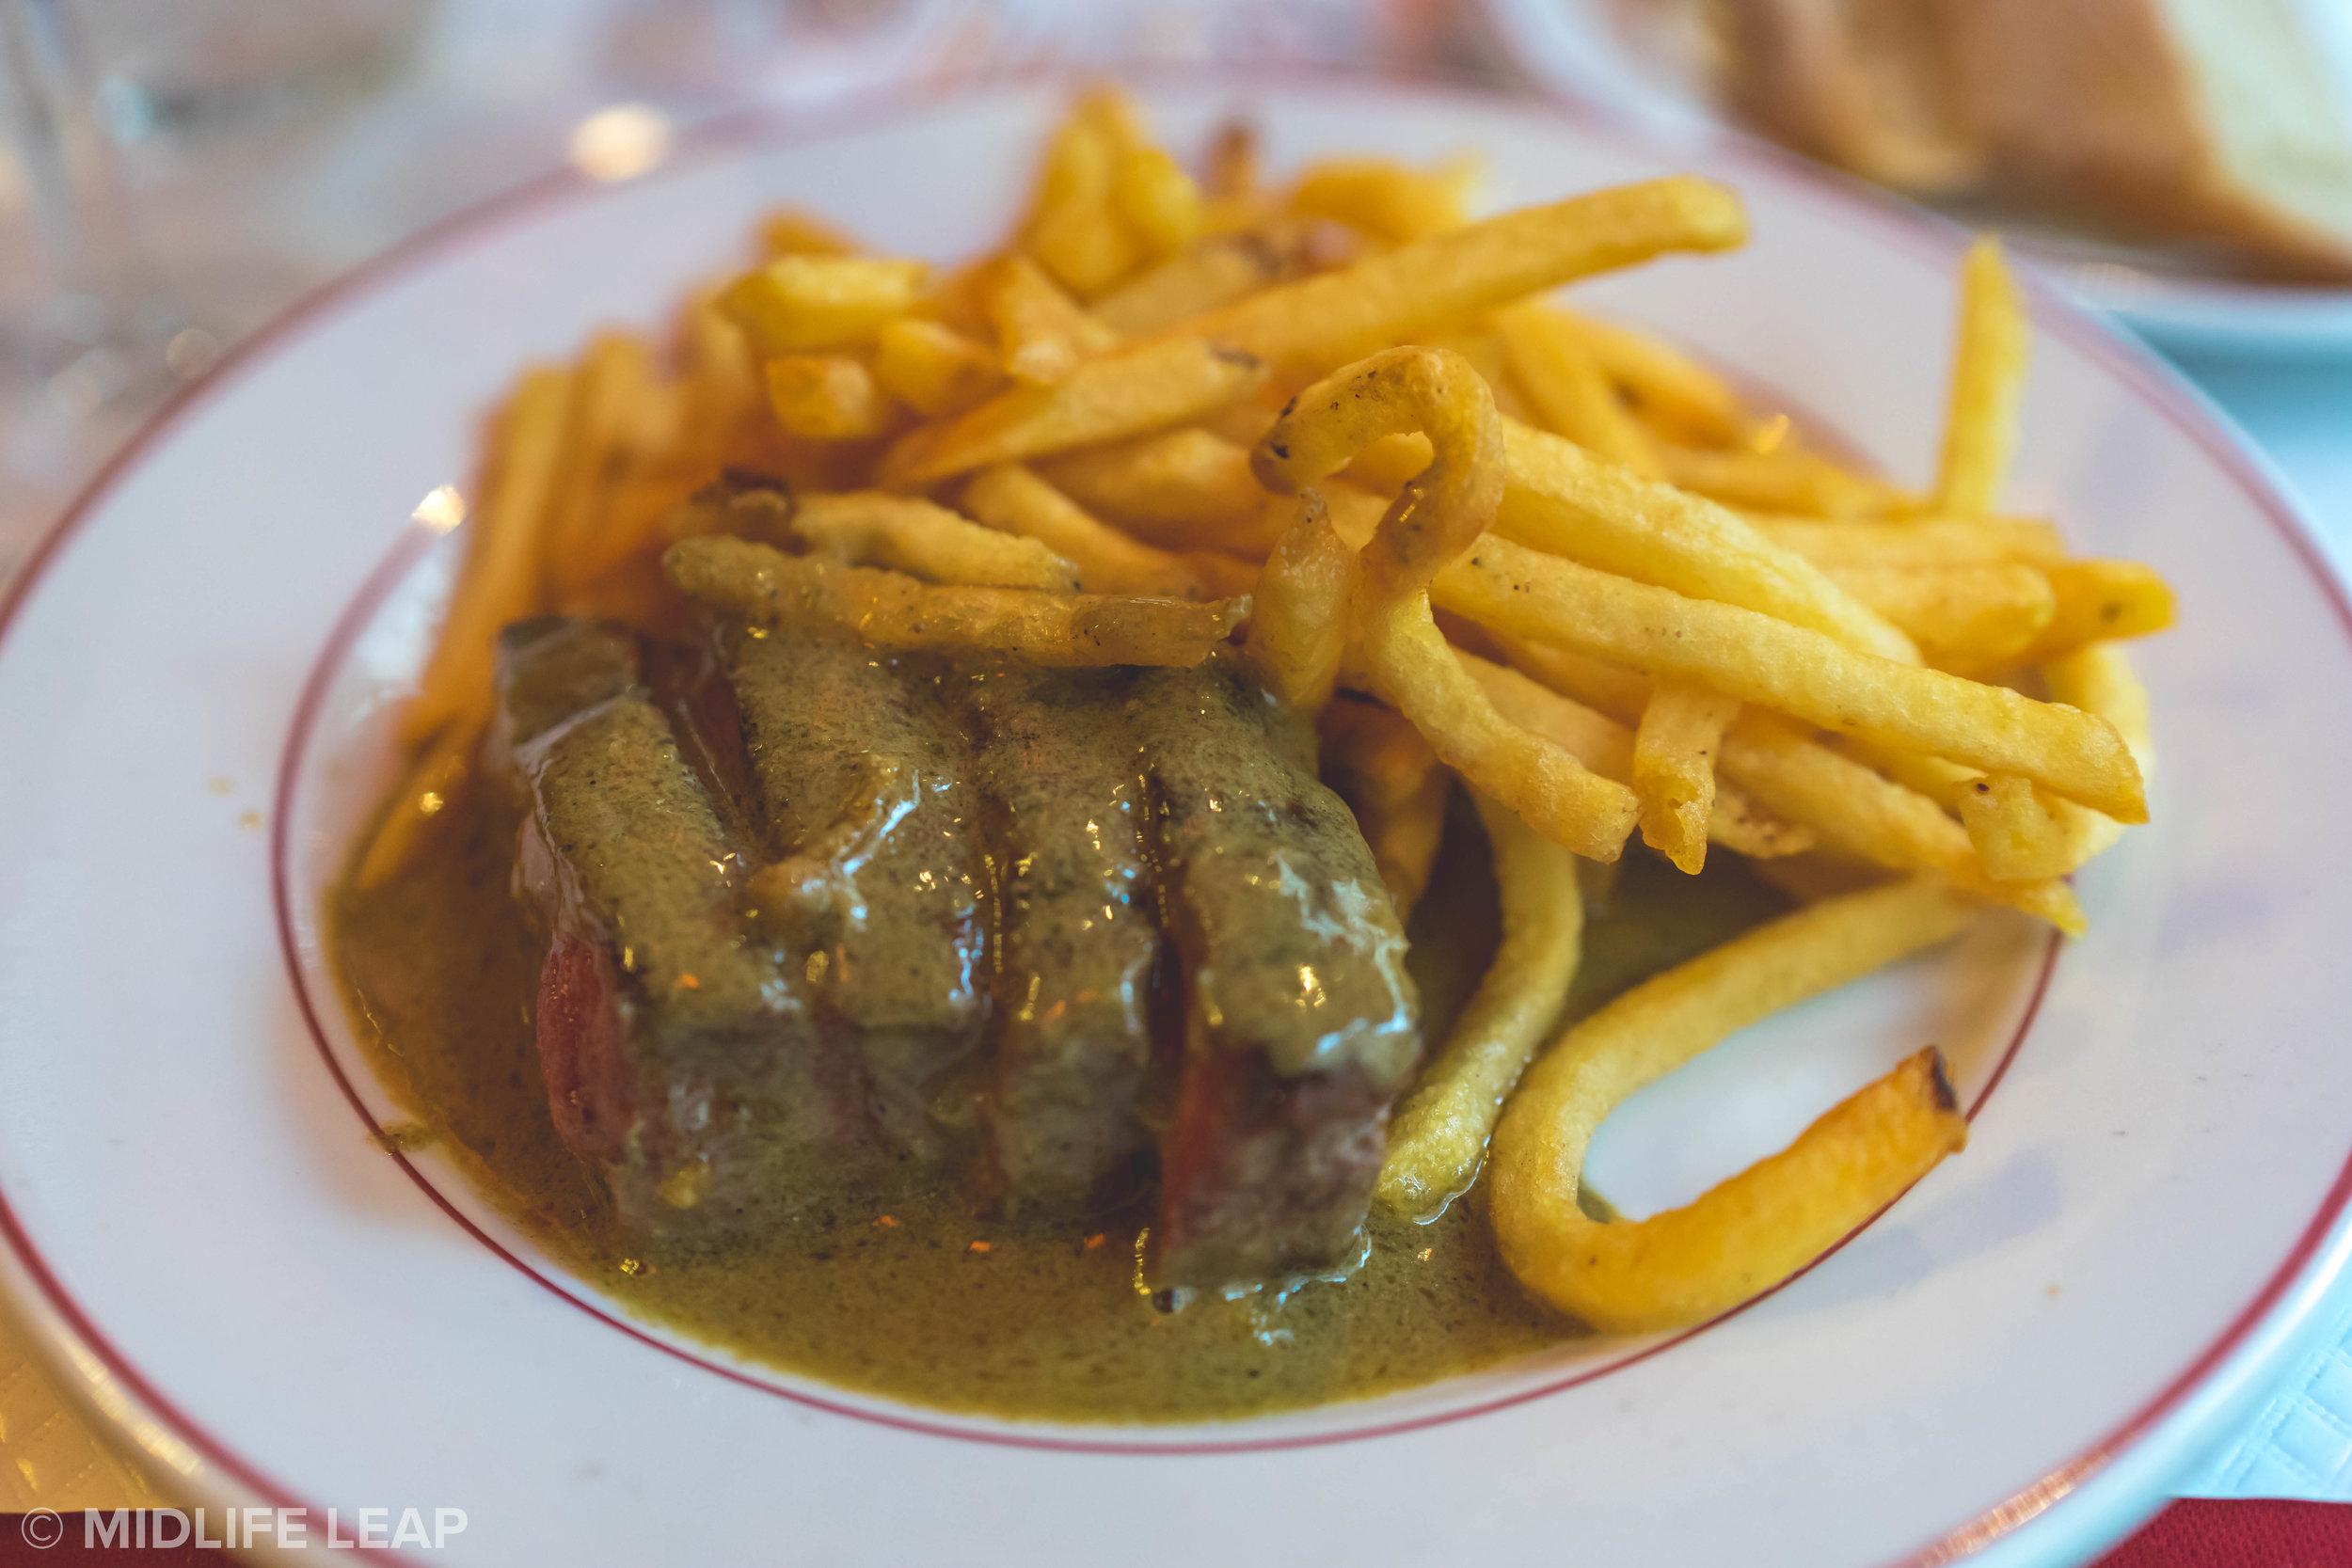 the-best-place-to-eat-in-saint-germain-paris-steak-frites